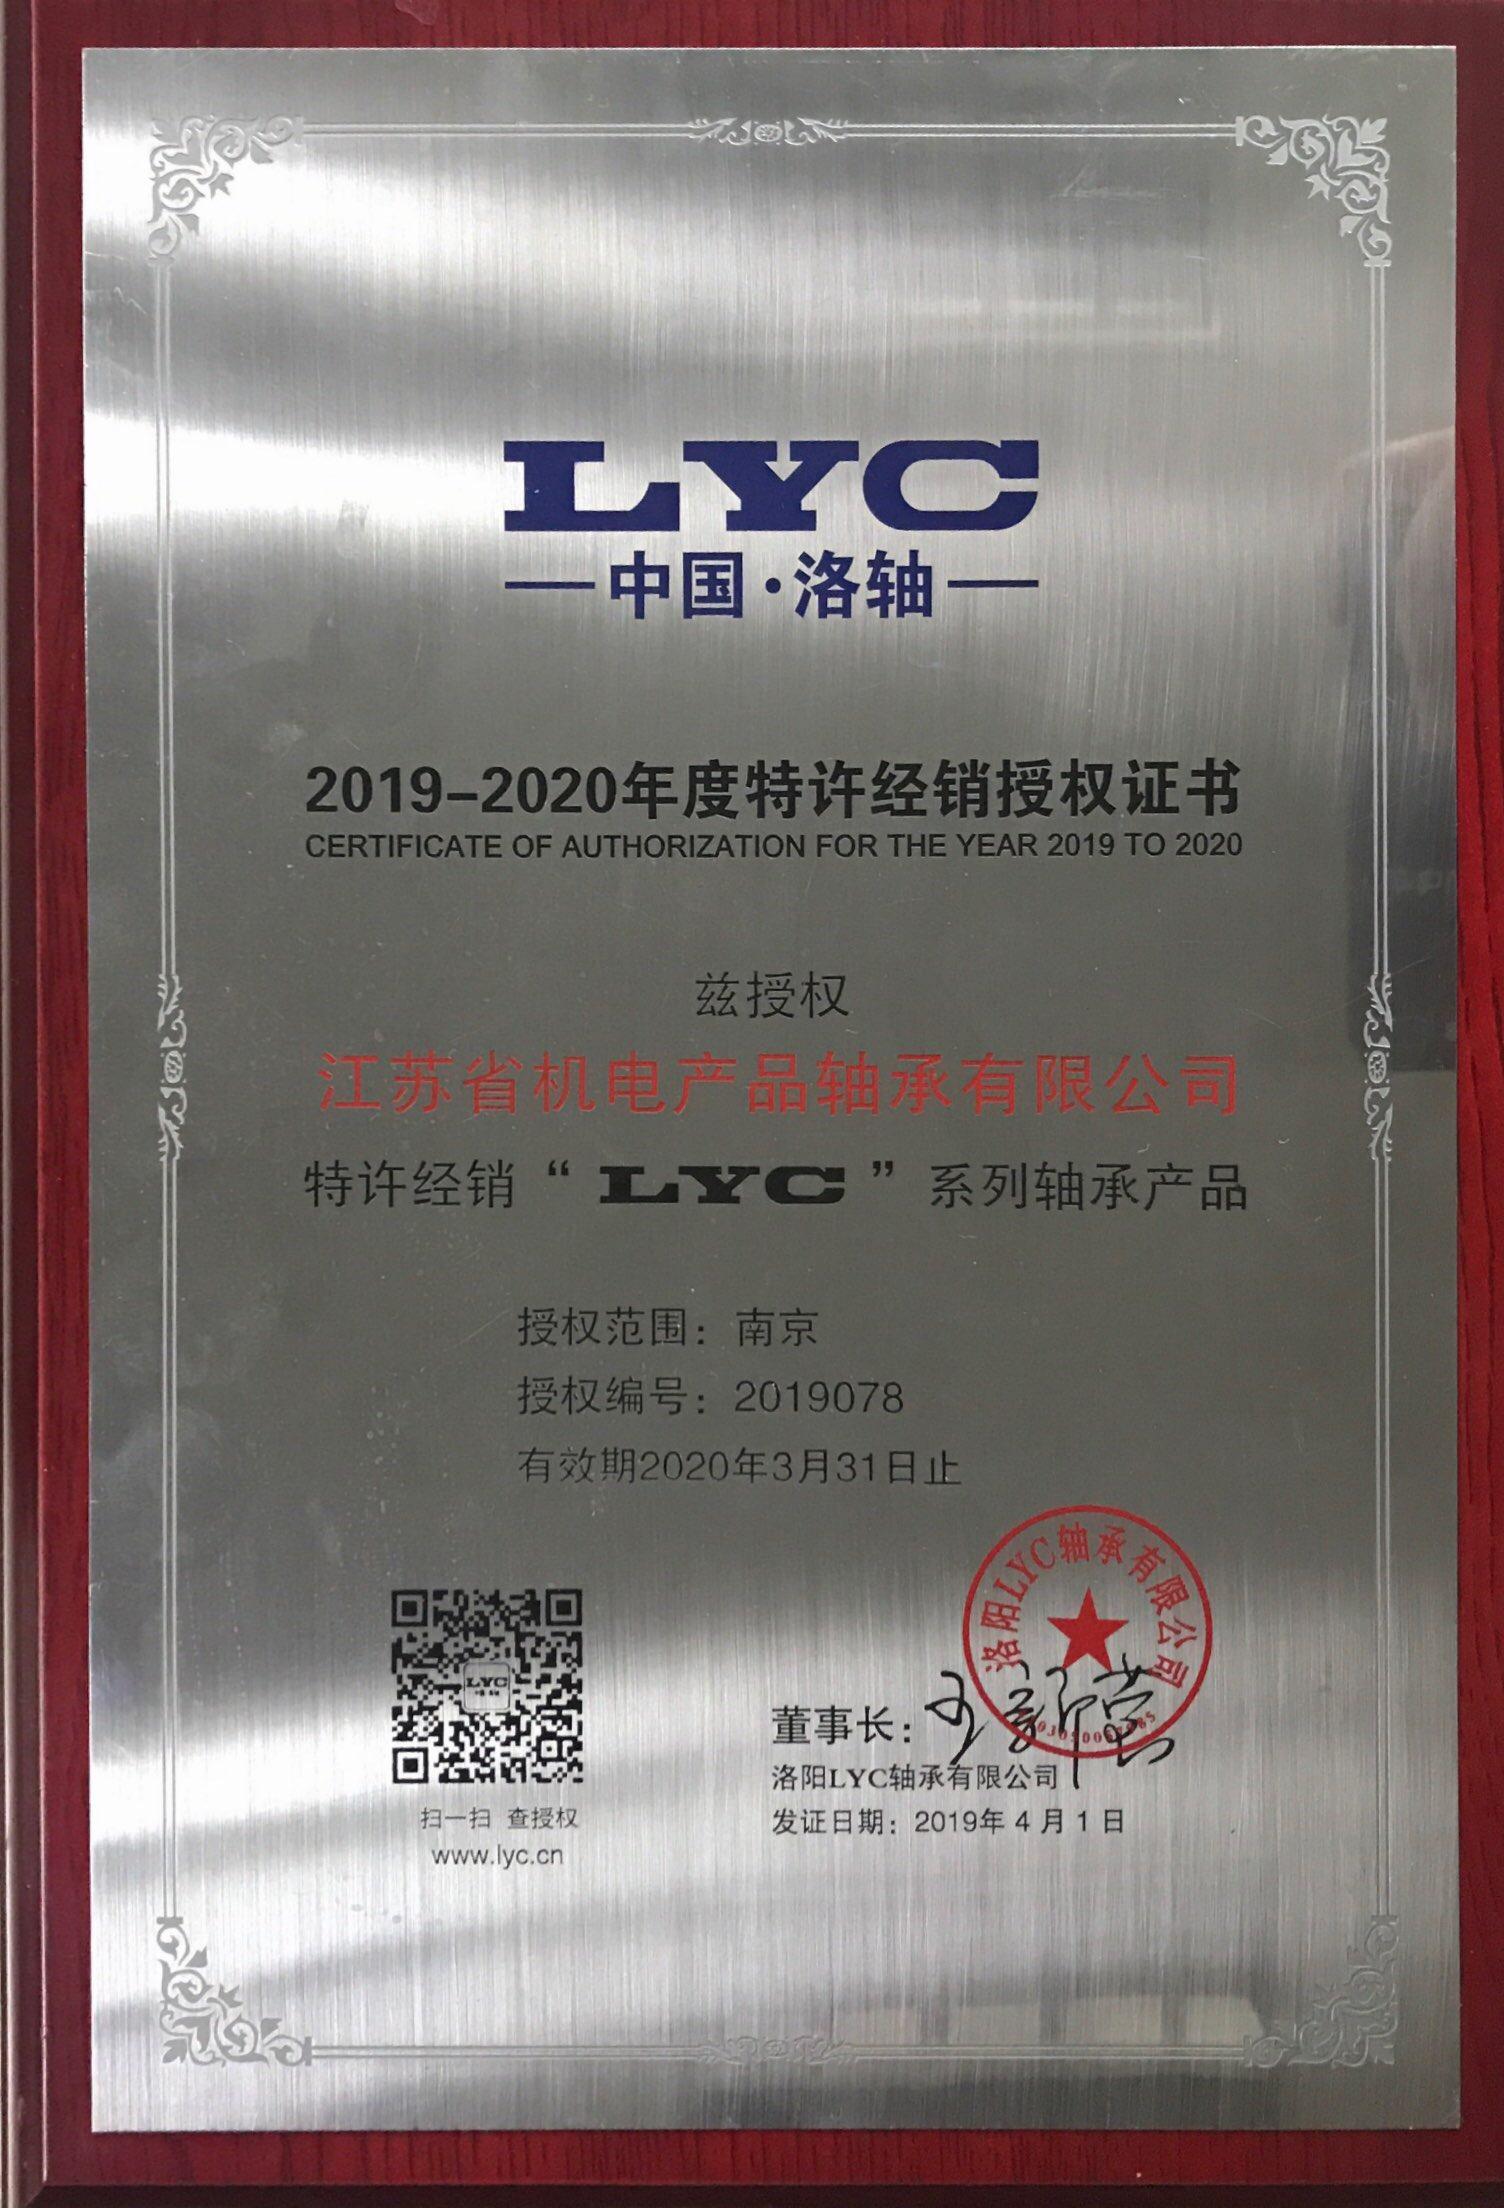 2019-2020LYC授权证书